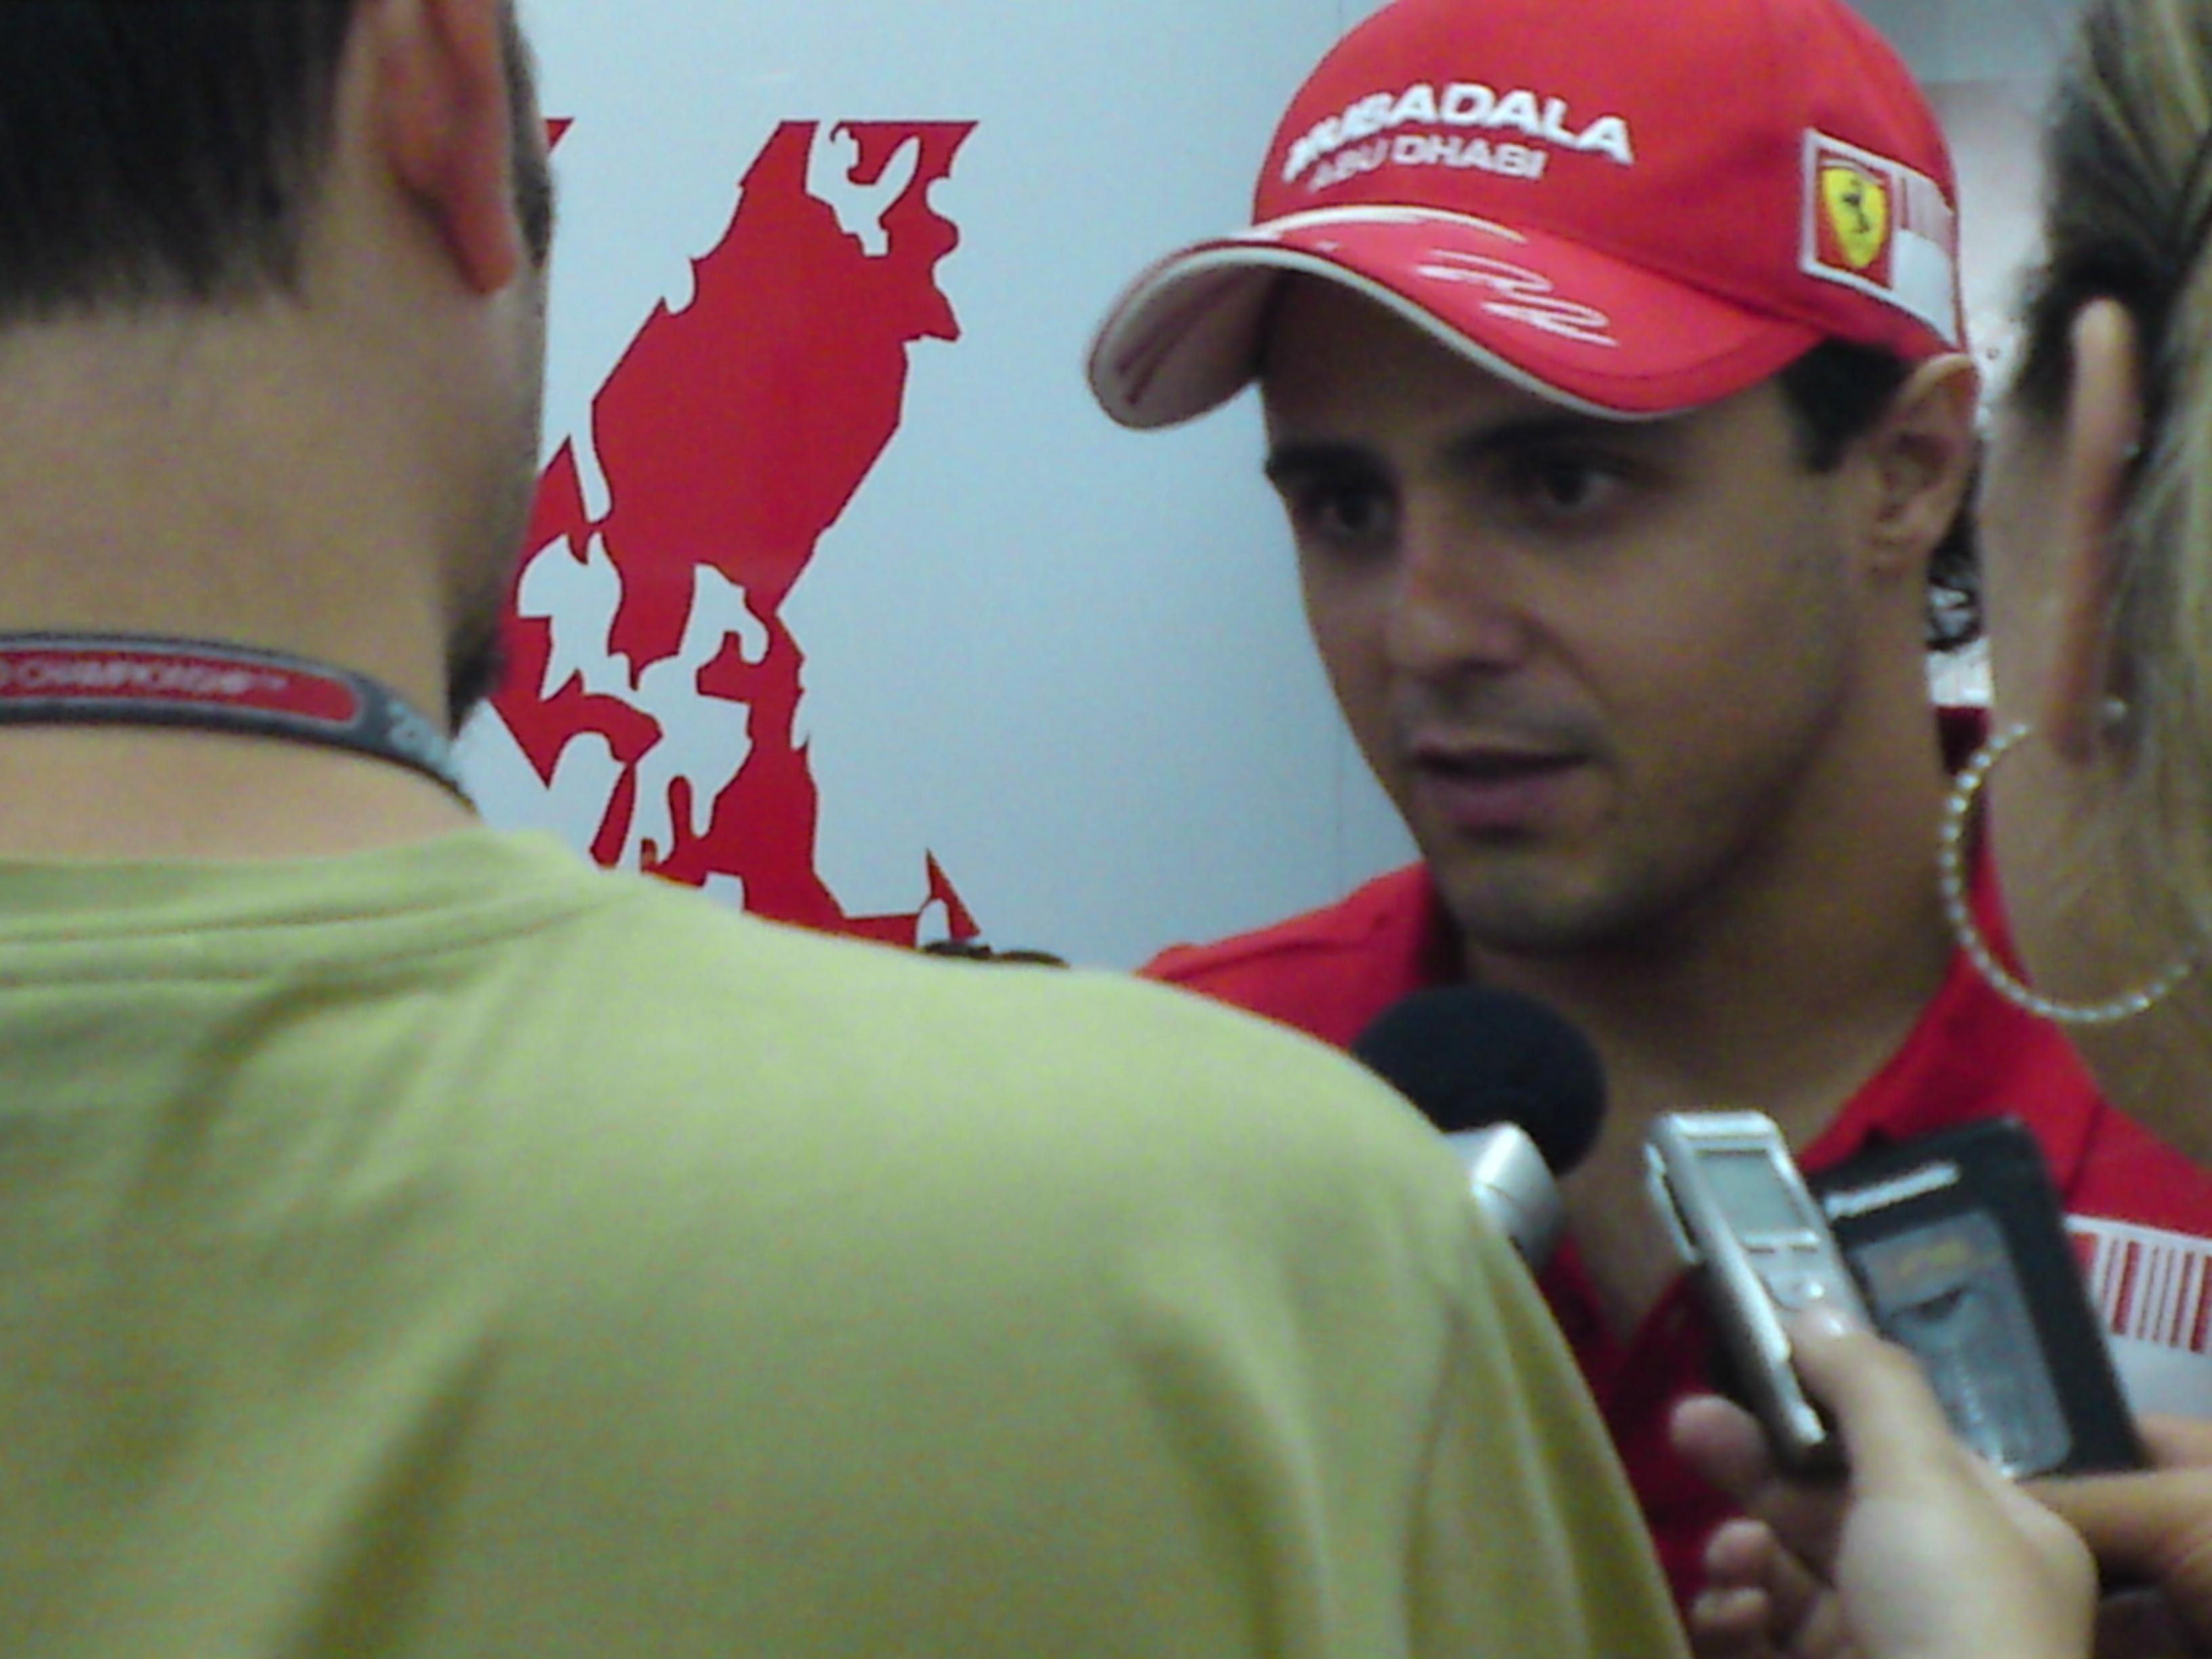 Massa - P16 on grid